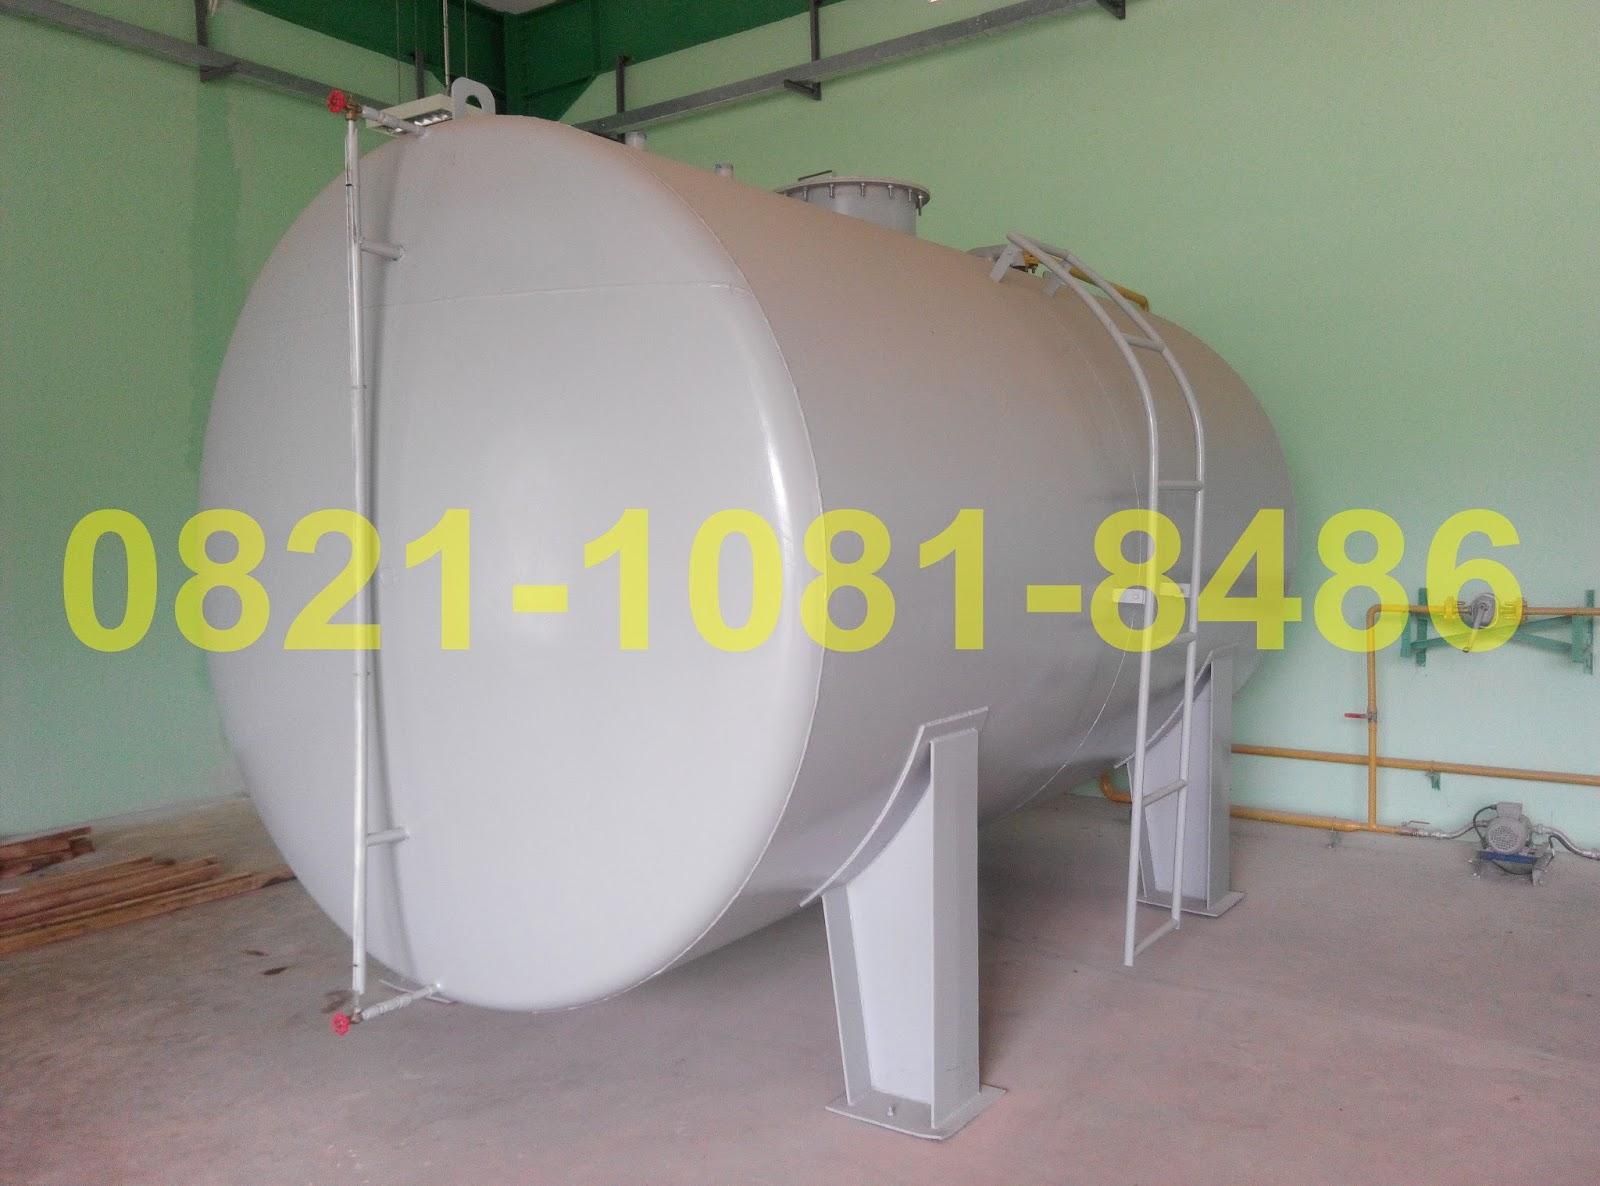 Jasa Fabrikasi Fuel Tank Di Indonesia Roll Hand Pipe Bender Krisbow 3 8 7 8in Kw1500520